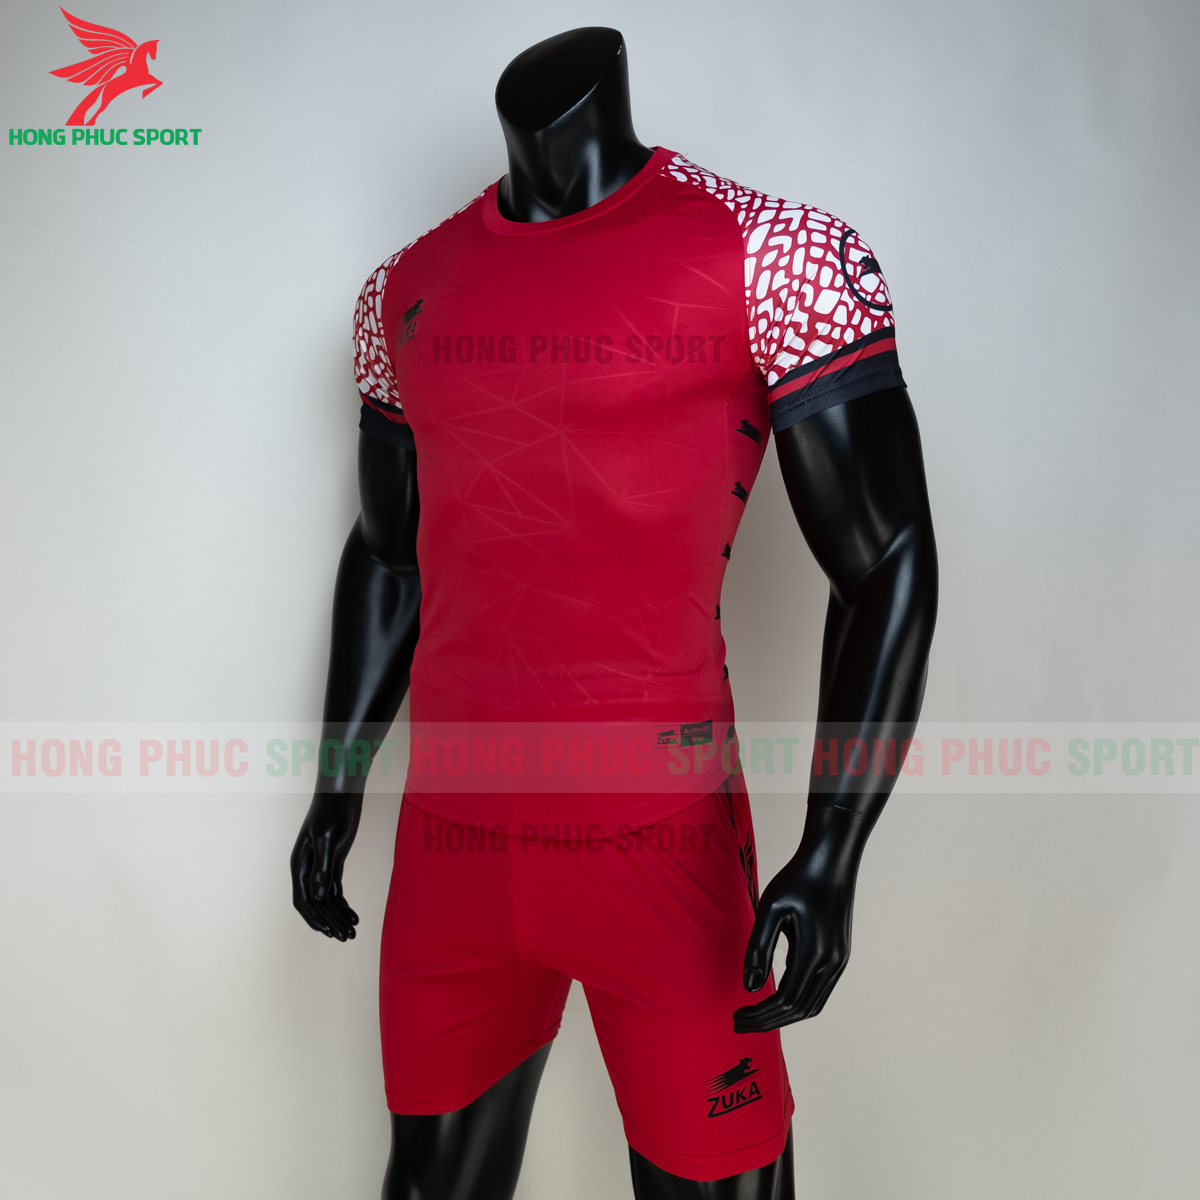 https://cdn.hongphucsport.com/unsafe/s4.shopbay.vn/files/285/ao-bong-da-khong-logo-zuka-02-mau-do-4-60503264050d5.png